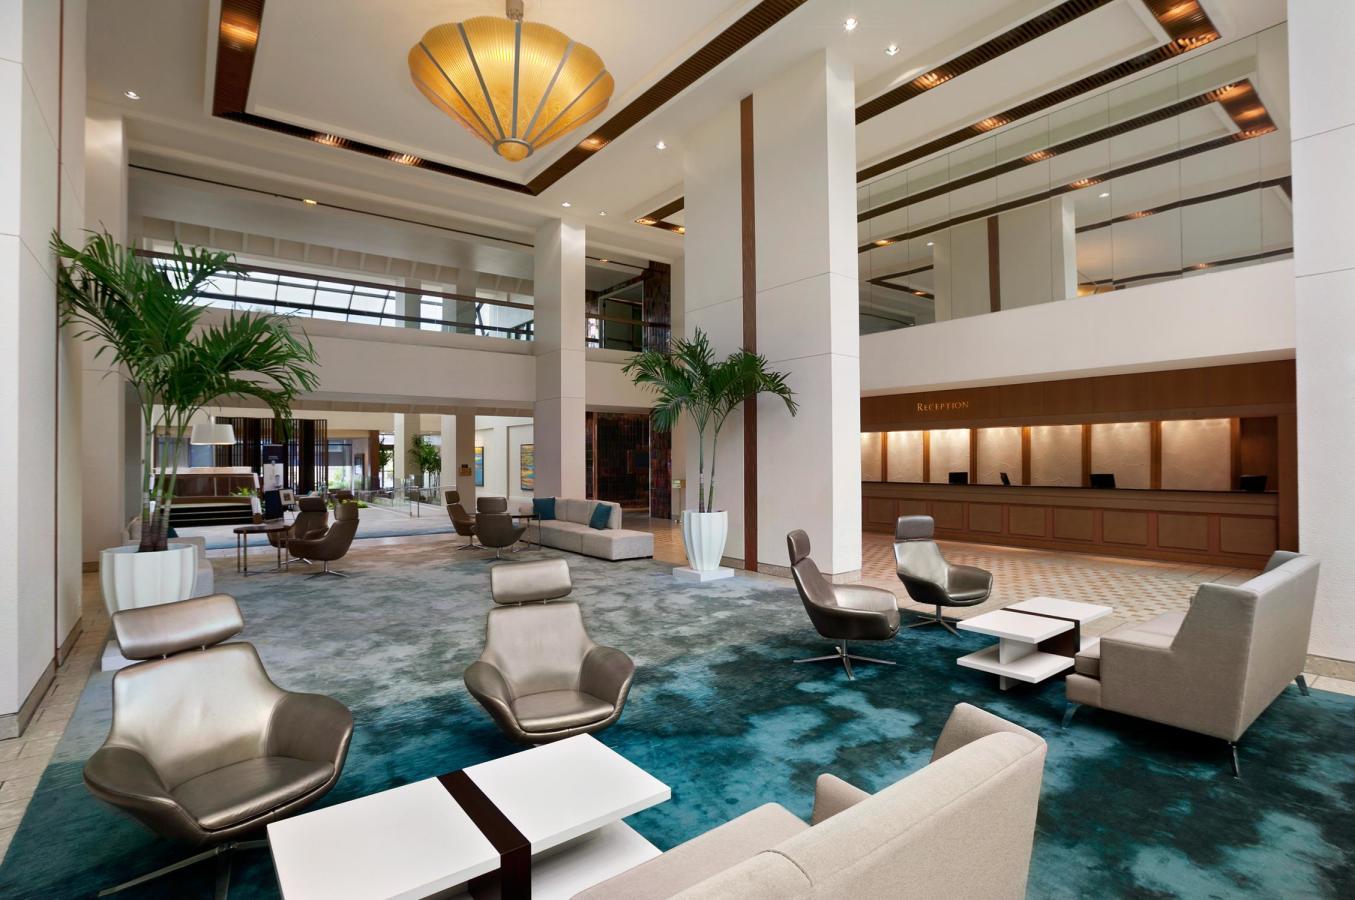 The Hilton Miami Airport Blue Lagoon Lobby